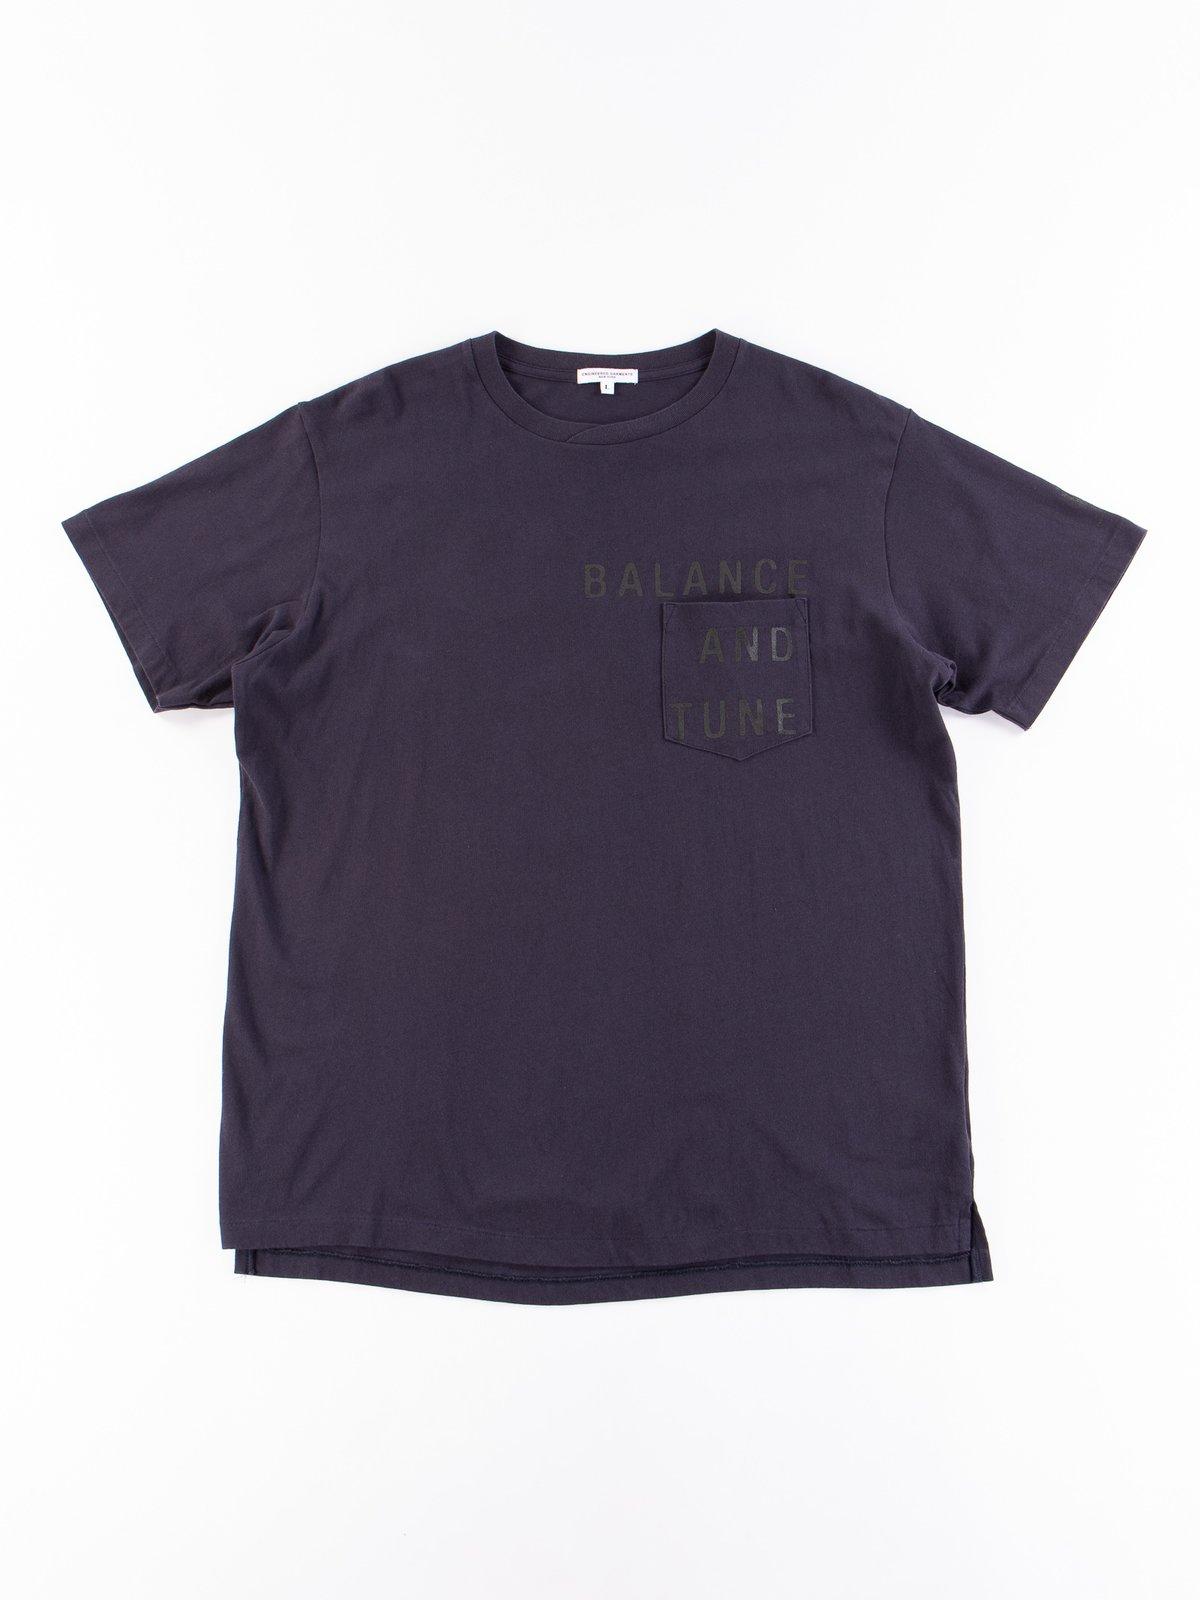 Navy Balance Printed Cross Crew Neck T–Shirt - Image 1